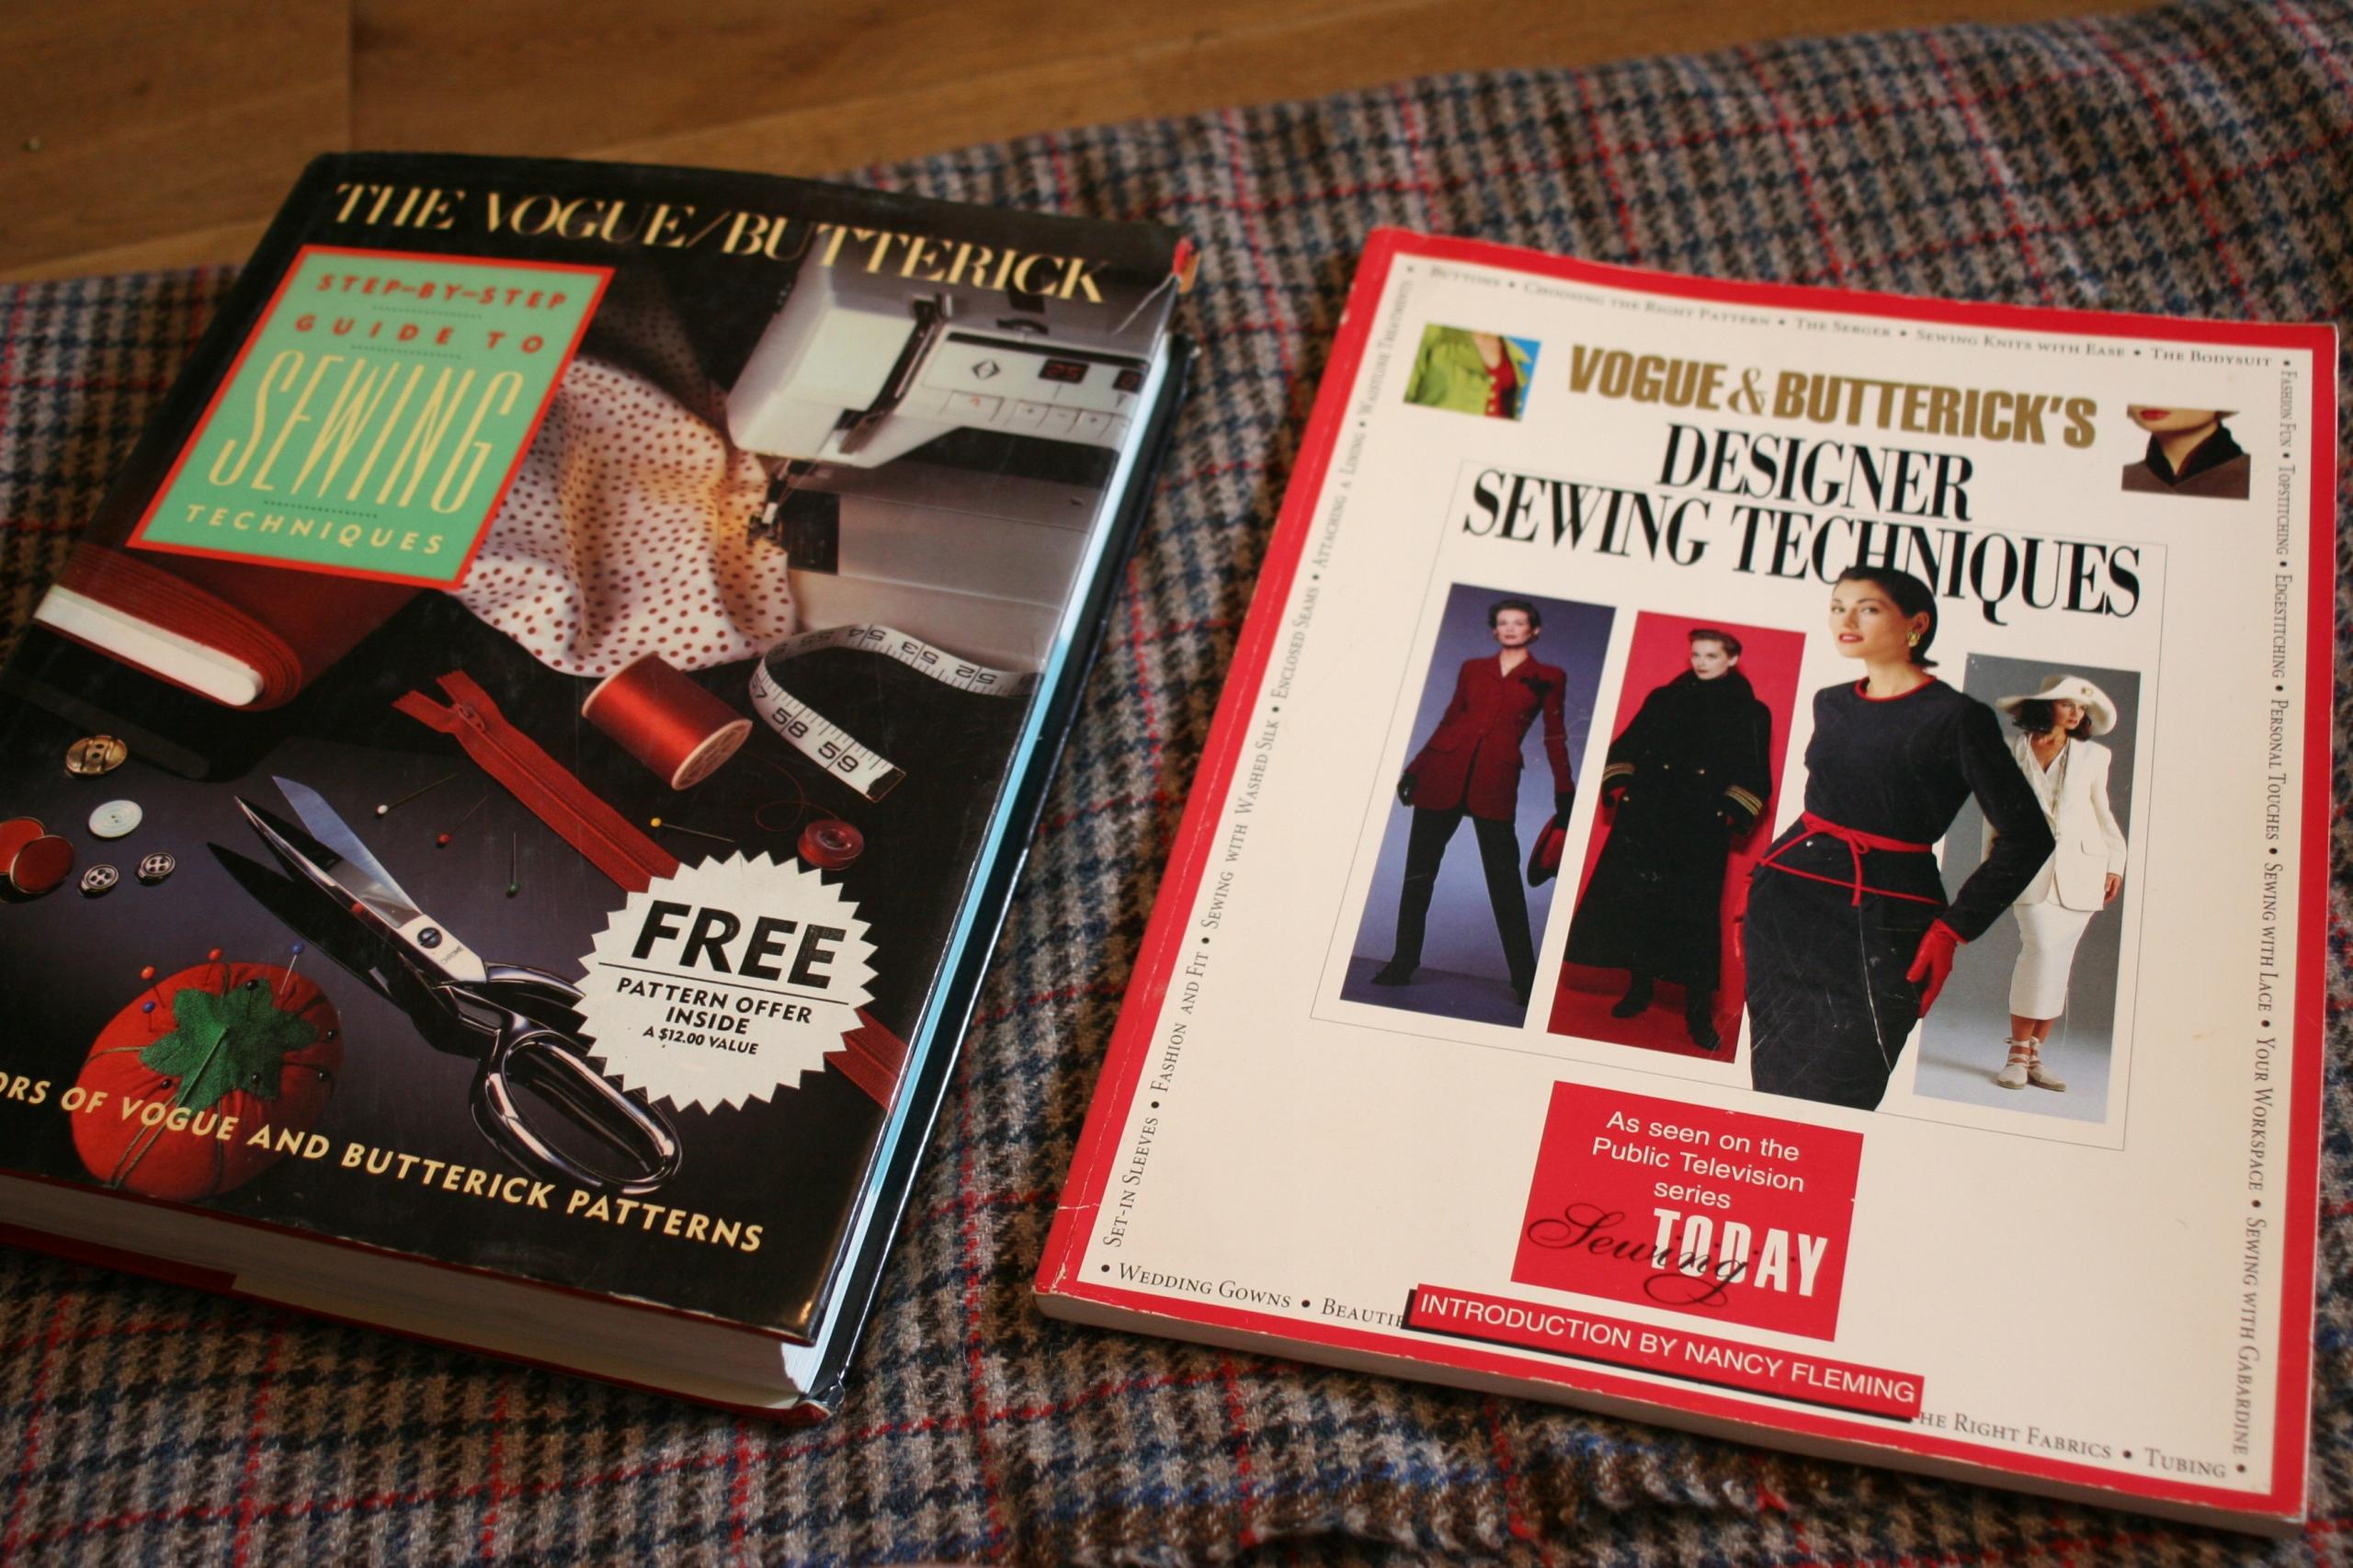 VOGUE BUTTERICK podręcznik vintage o szyciu 415 st